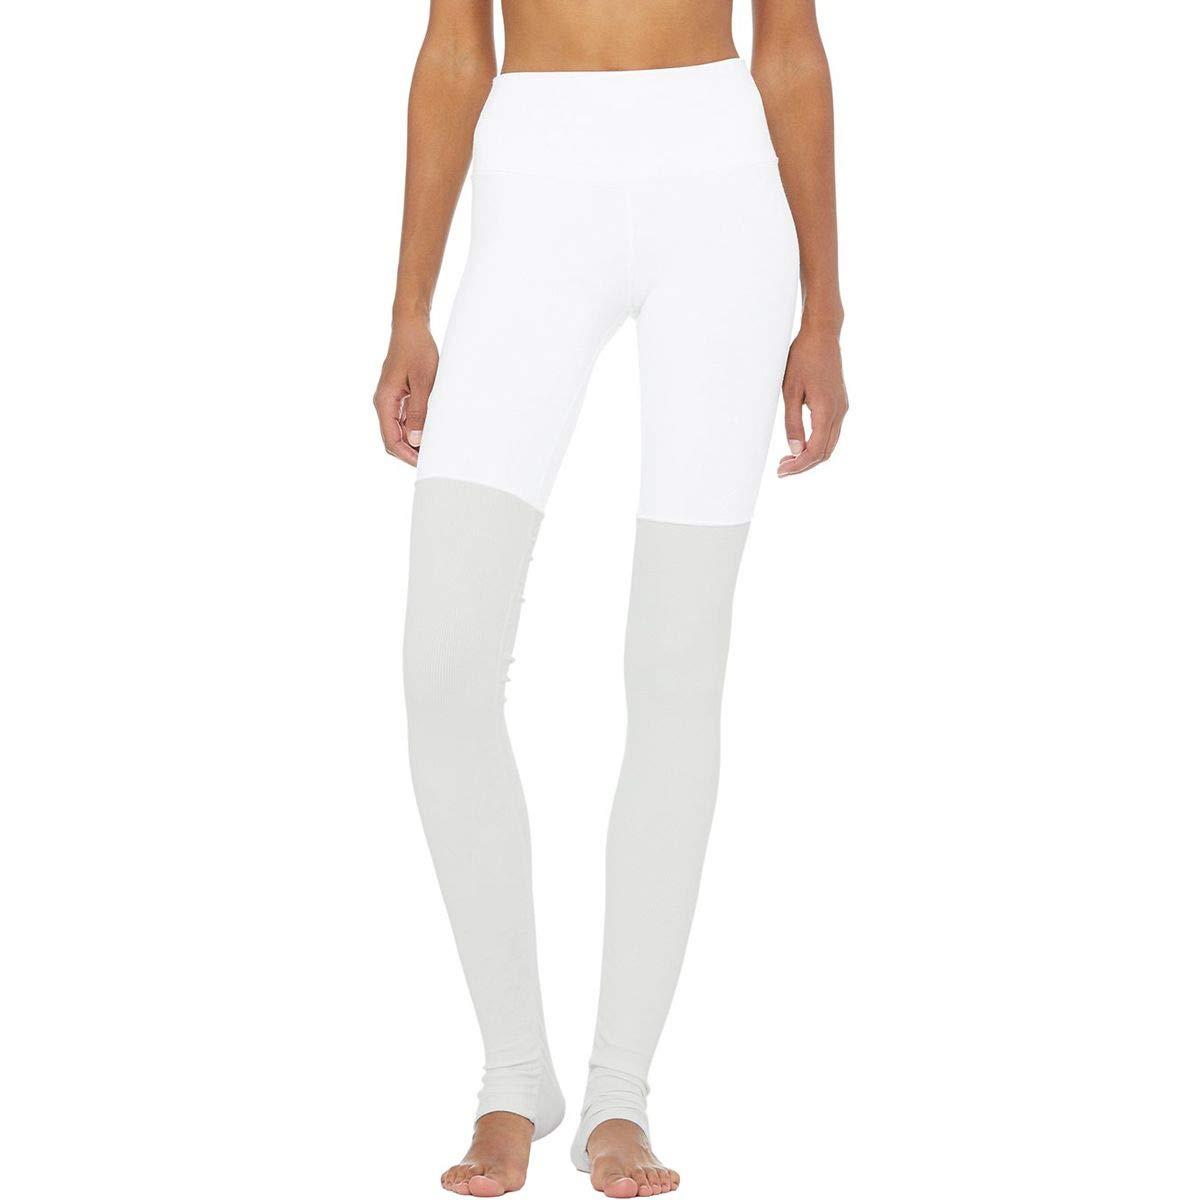 Alo Yoga High-Waist Goddess Legging - Women's White/Dove Grey Heather, XS by Alo Yoga (Image #1)